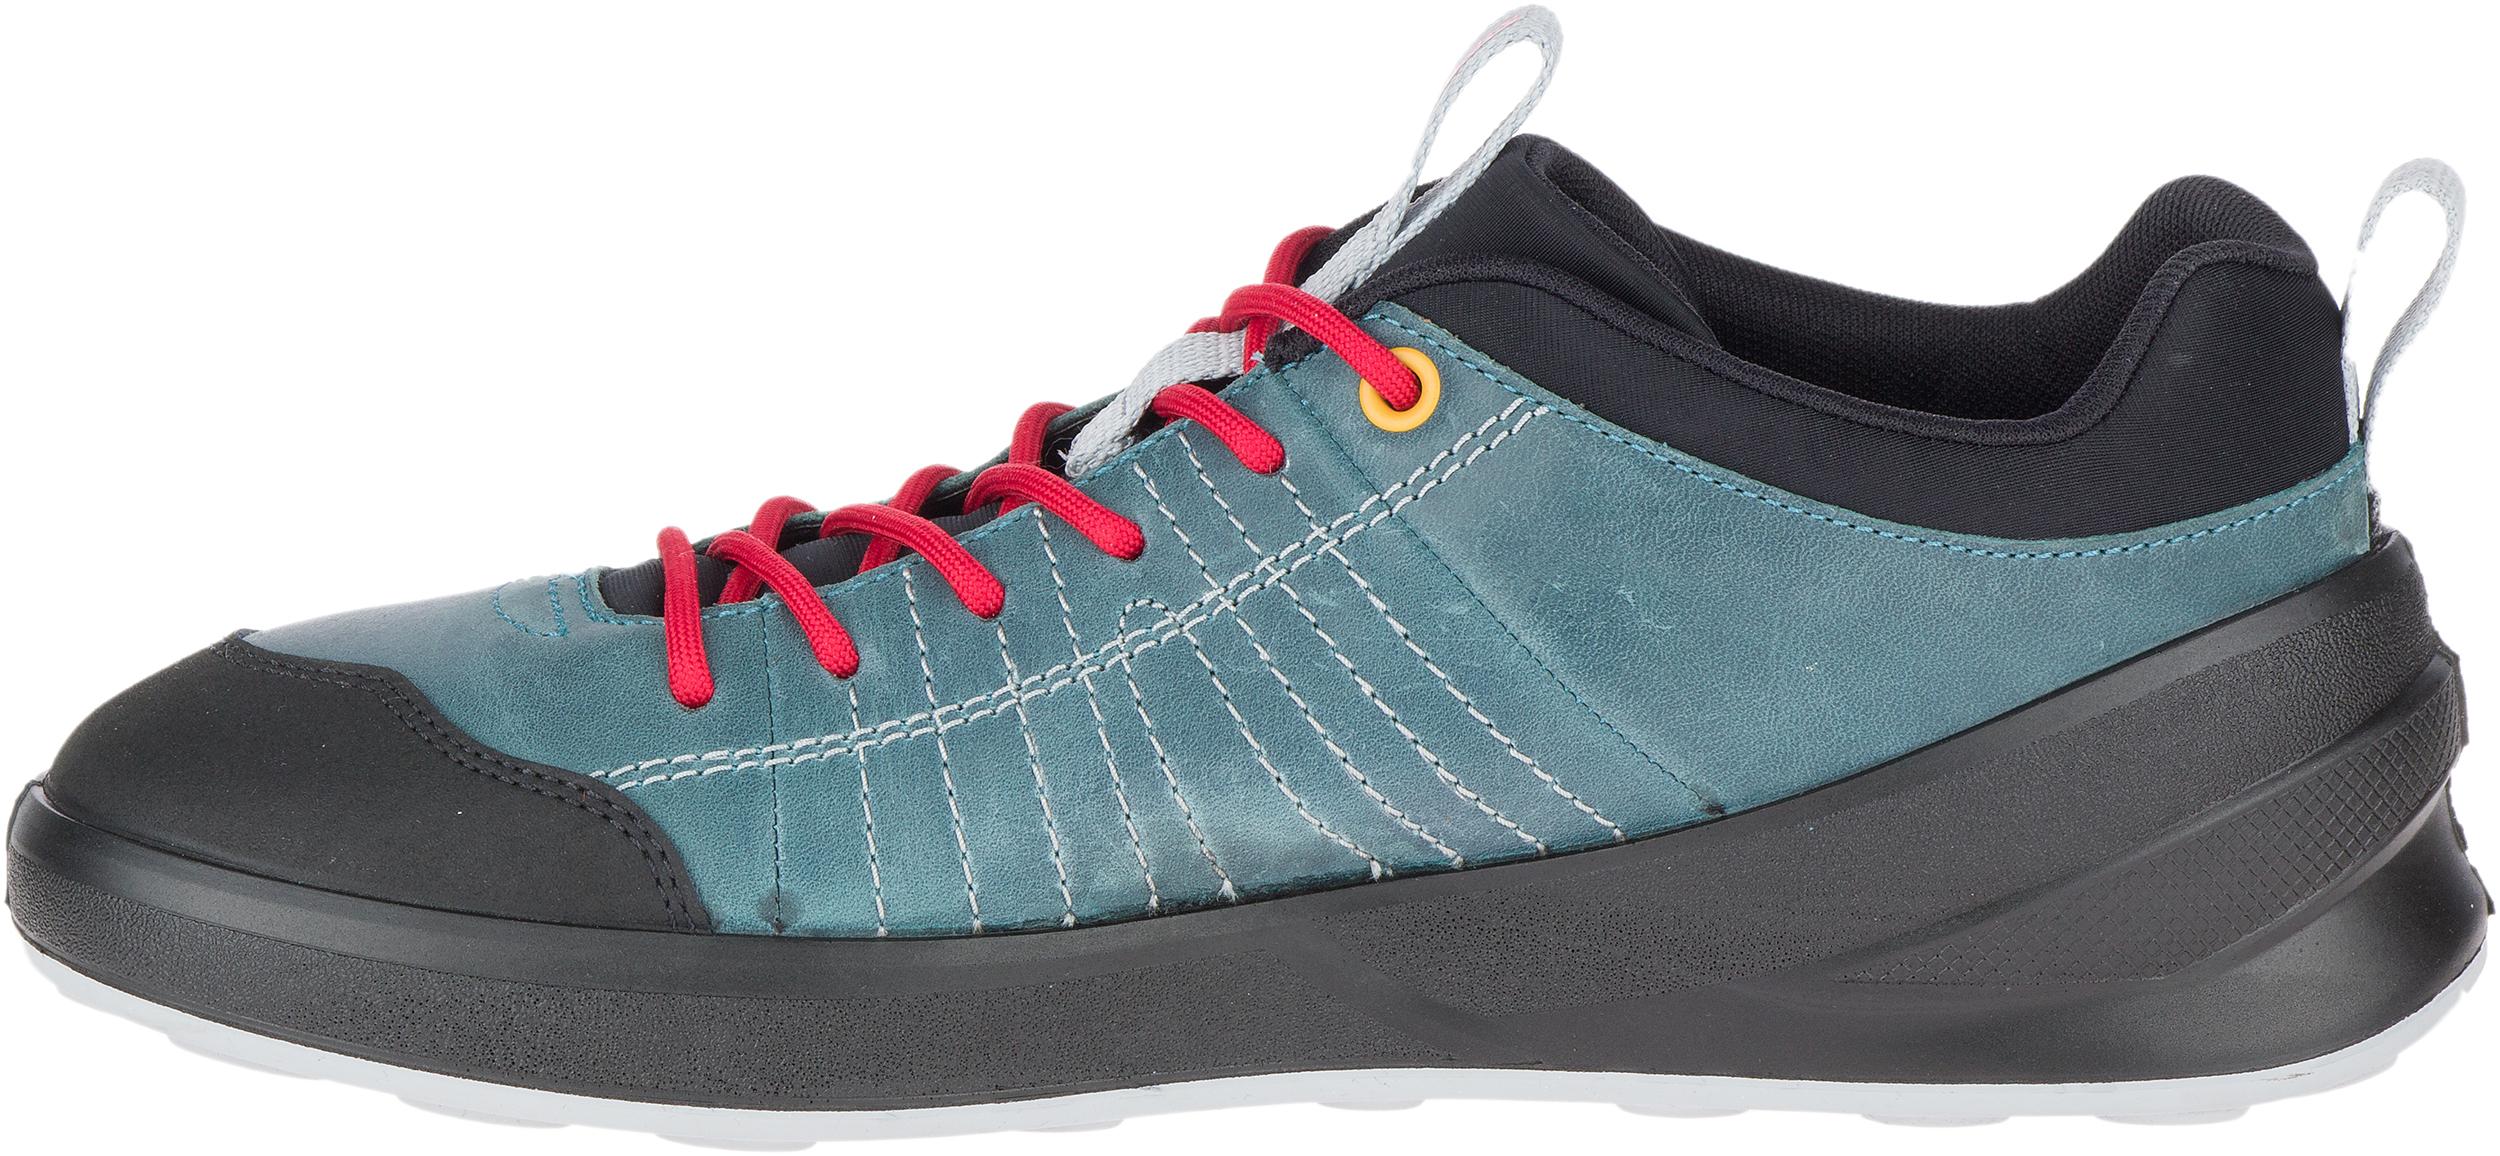 Hommes De Chaussures Valley Ascent Merrell WIDH9YE2